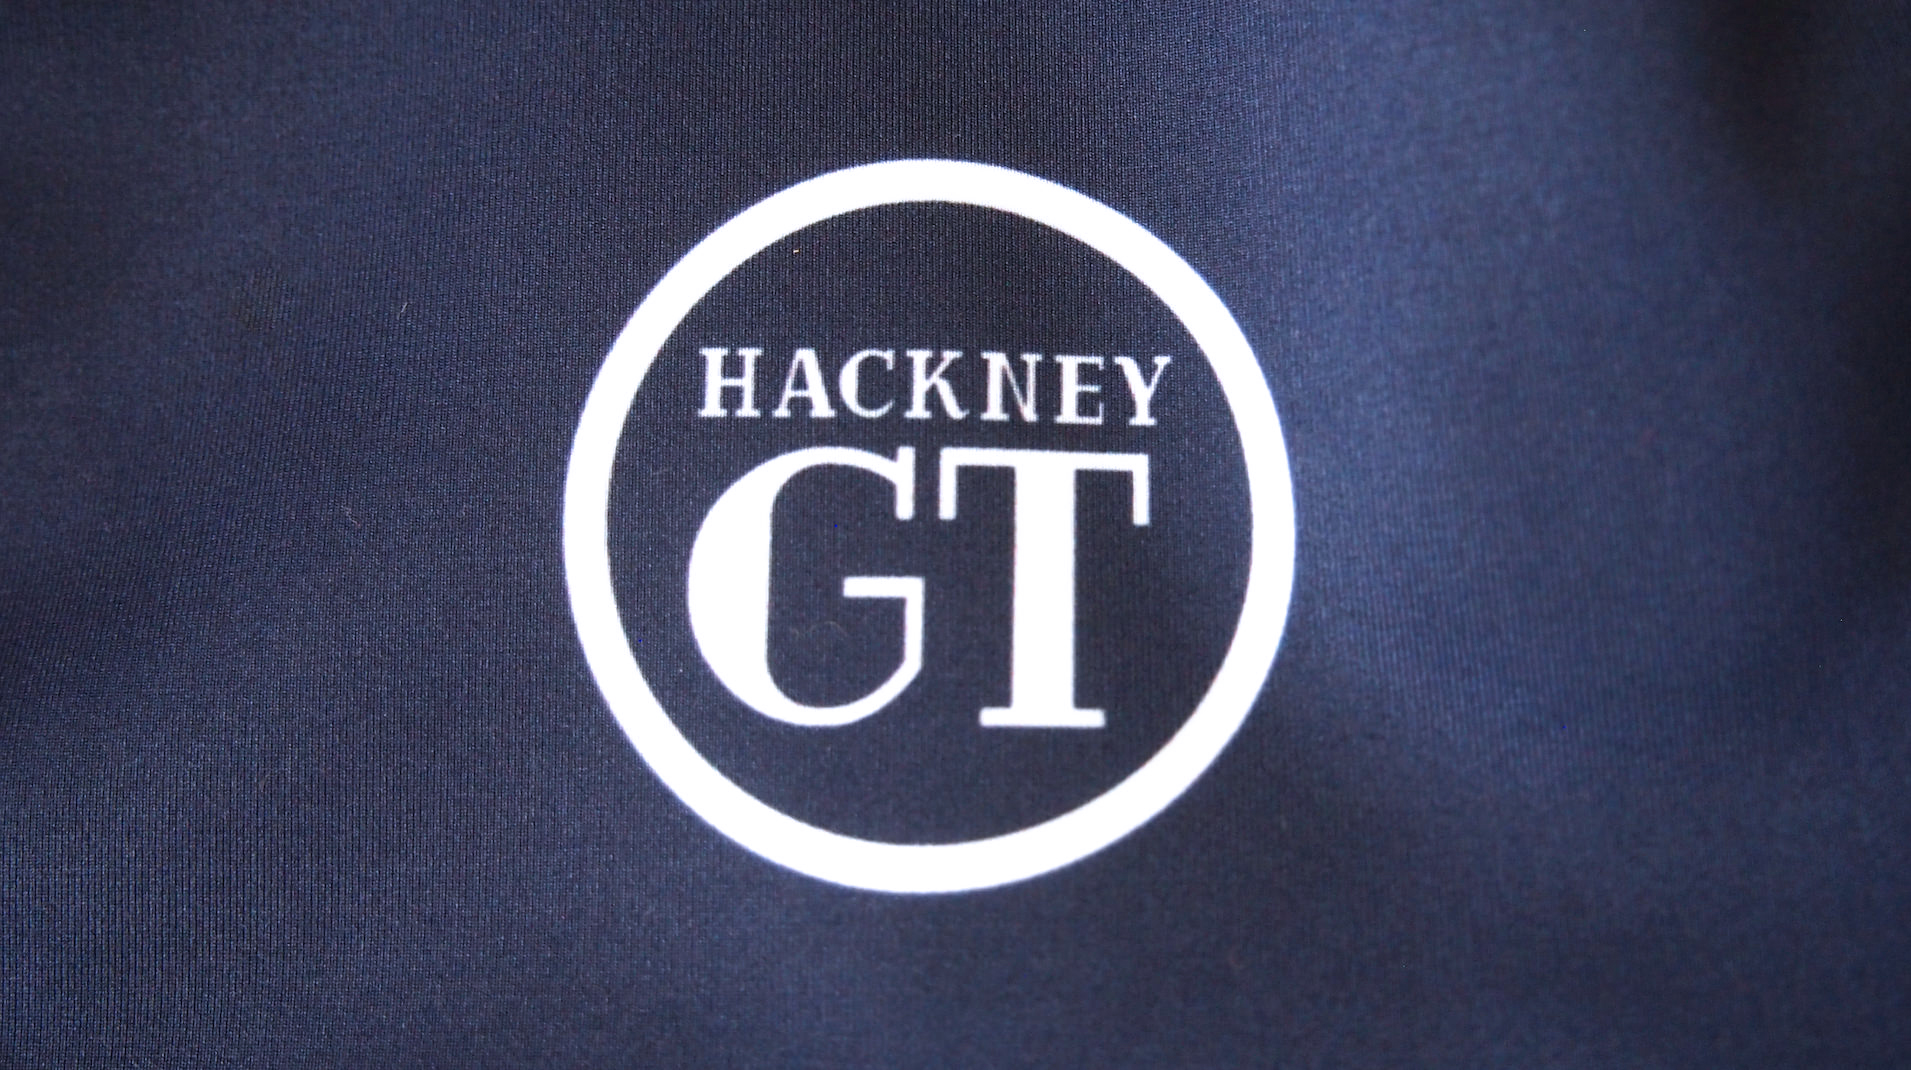 HackneyGT ロゴマーク